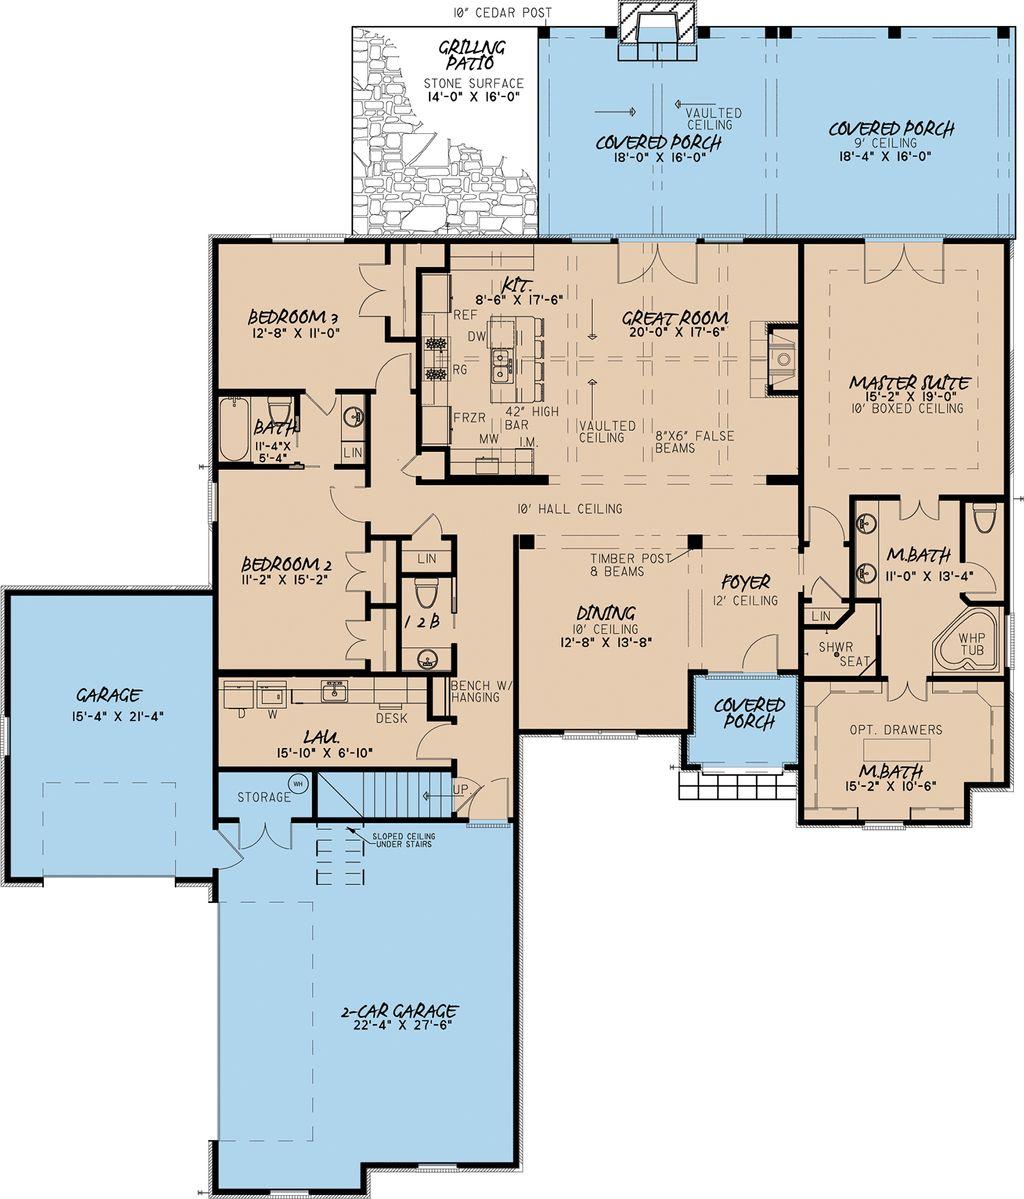 European Style House Plan 3 Beds 2 5 Baths 2428 Sq Ft